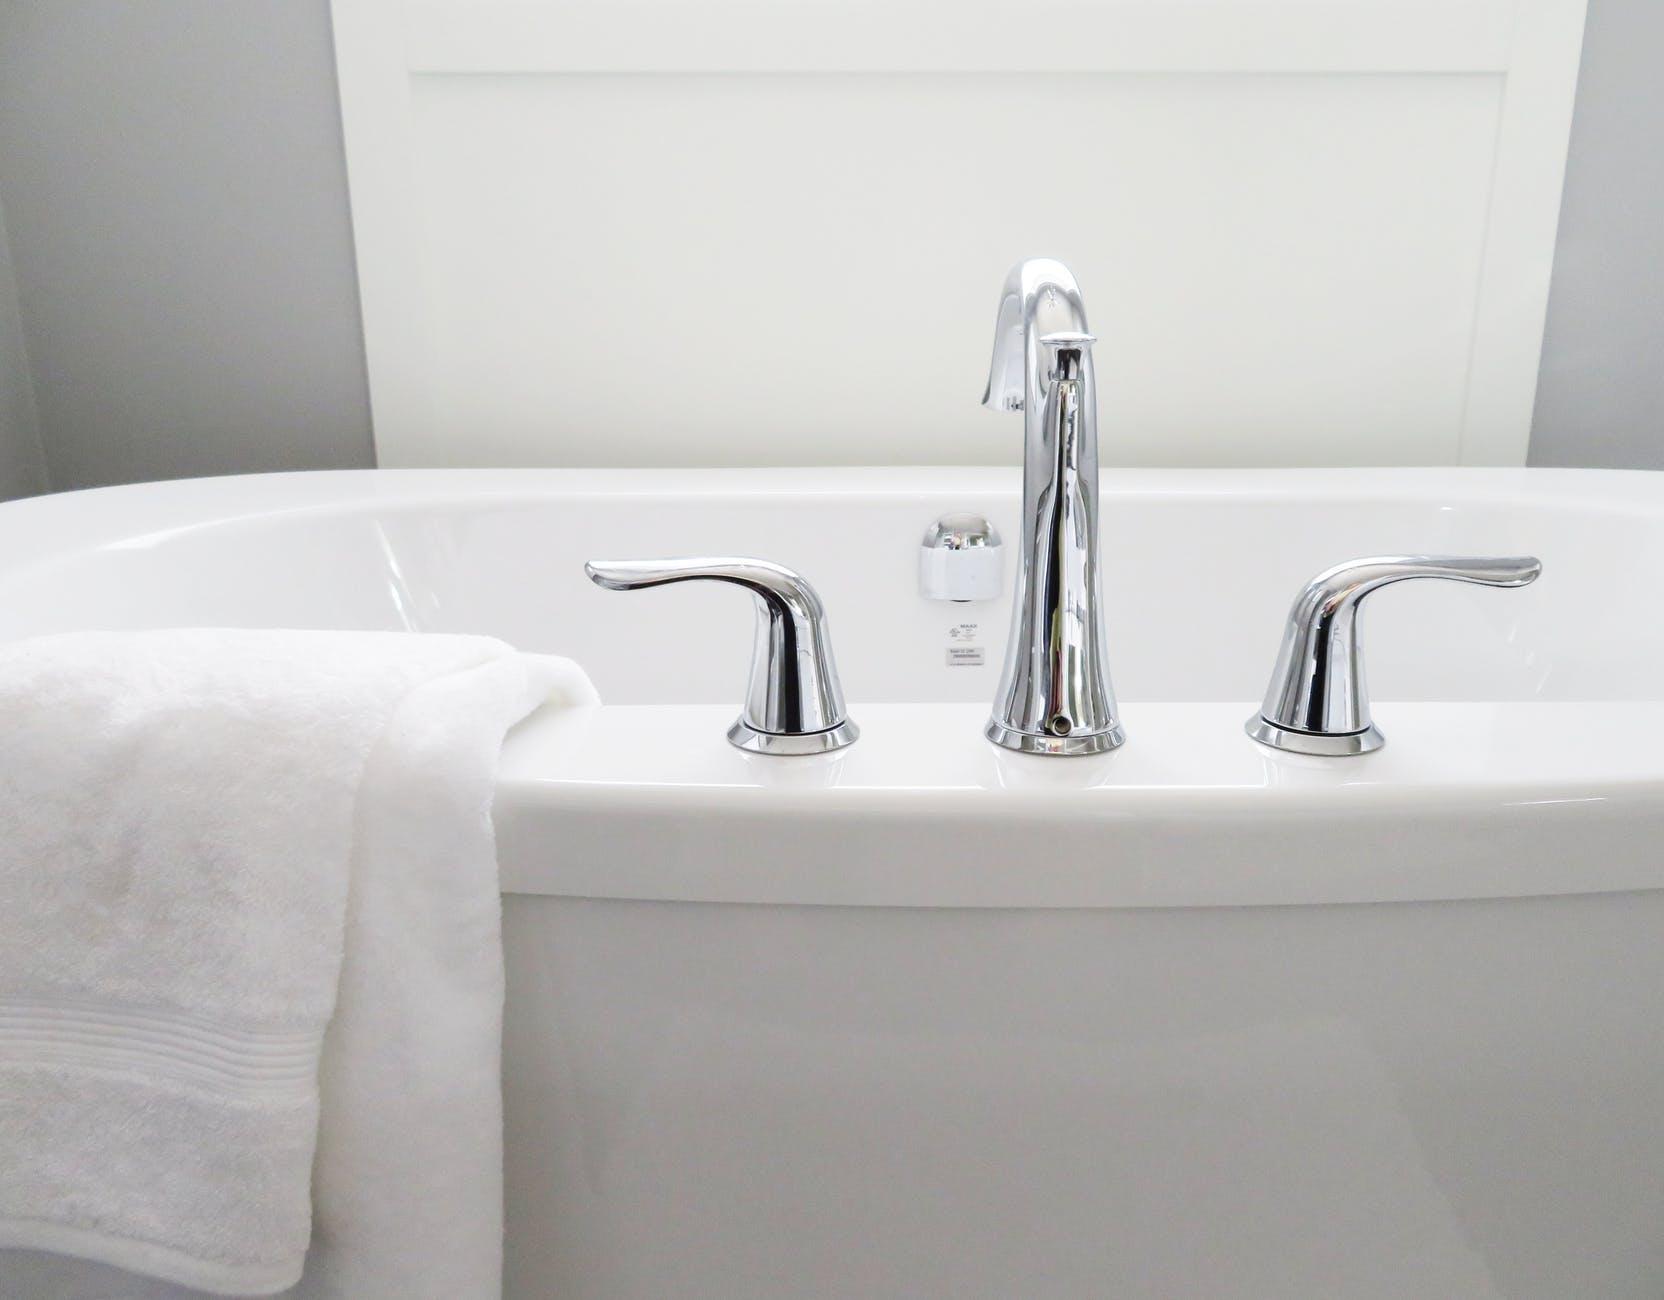 Eliminate bathtub ring using nail polish remover